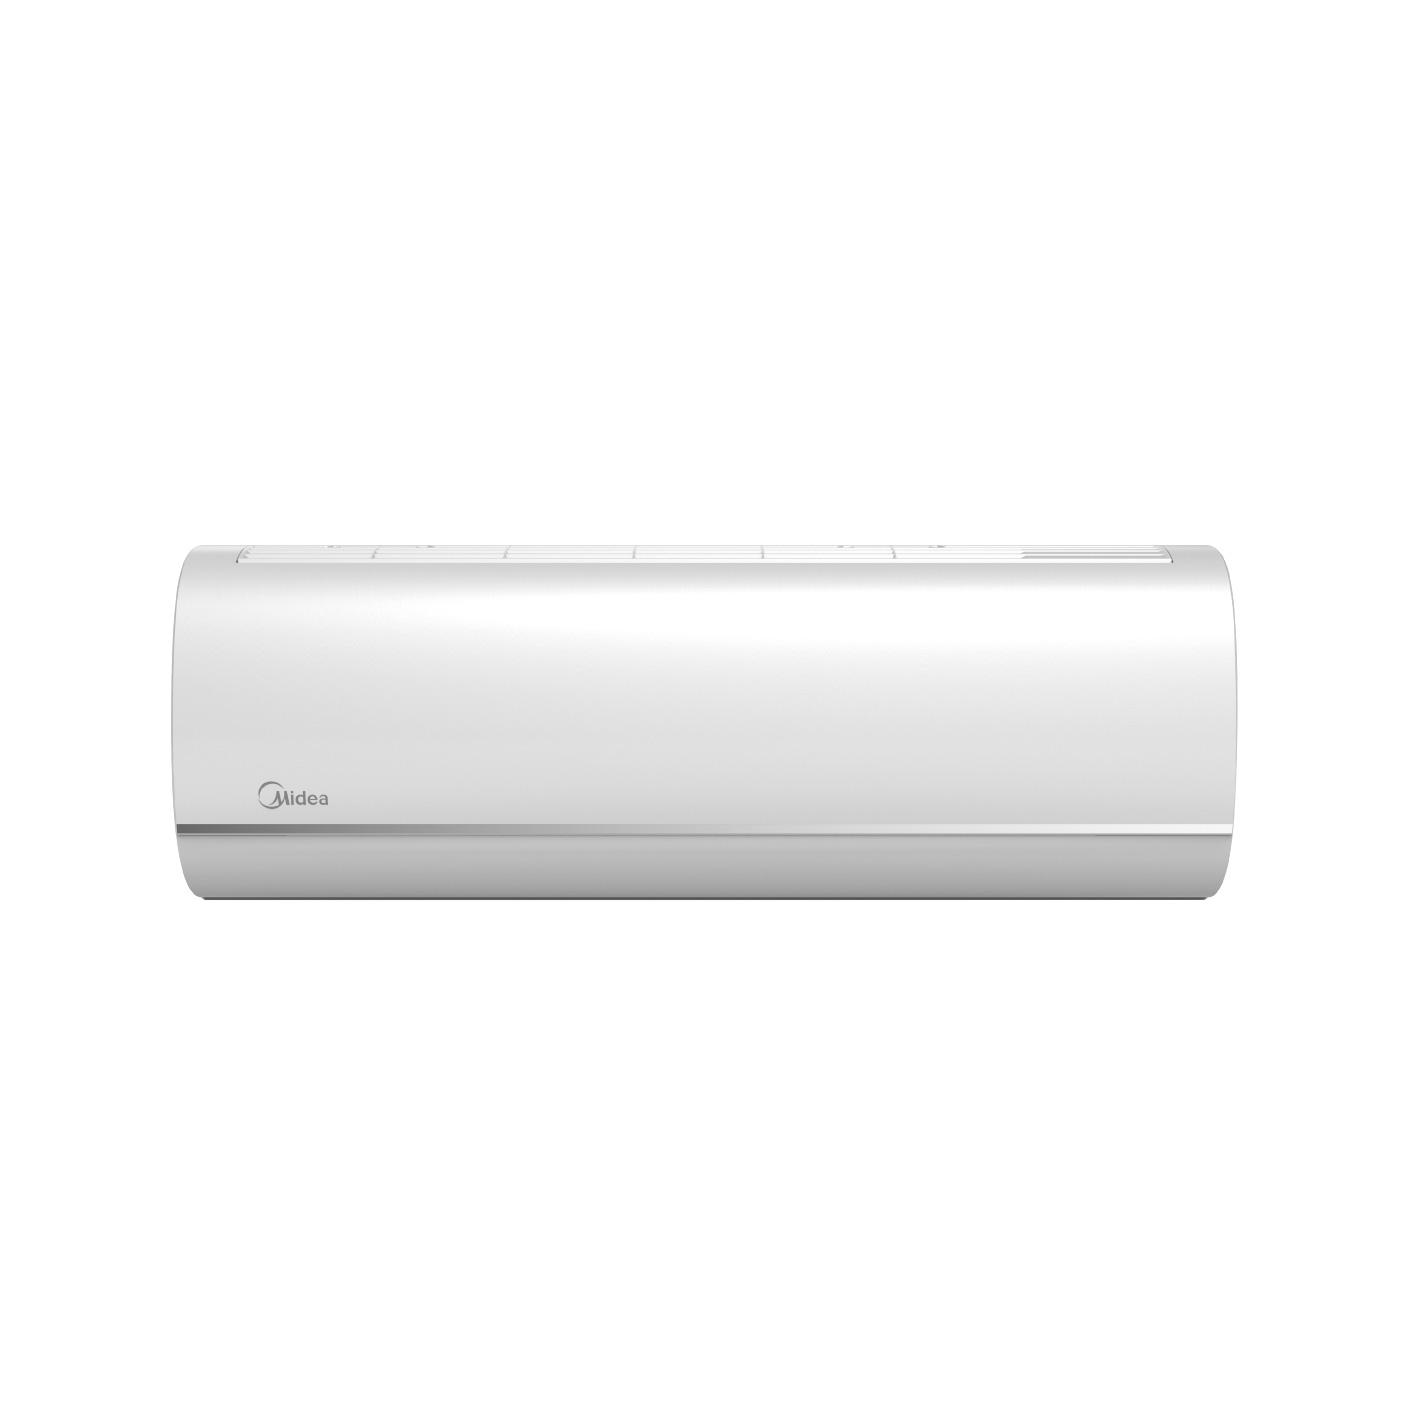 Midea/美的 KFR-26GW/BP3DN1Y-YA201(B2)家用空调套机 说明书.pdf